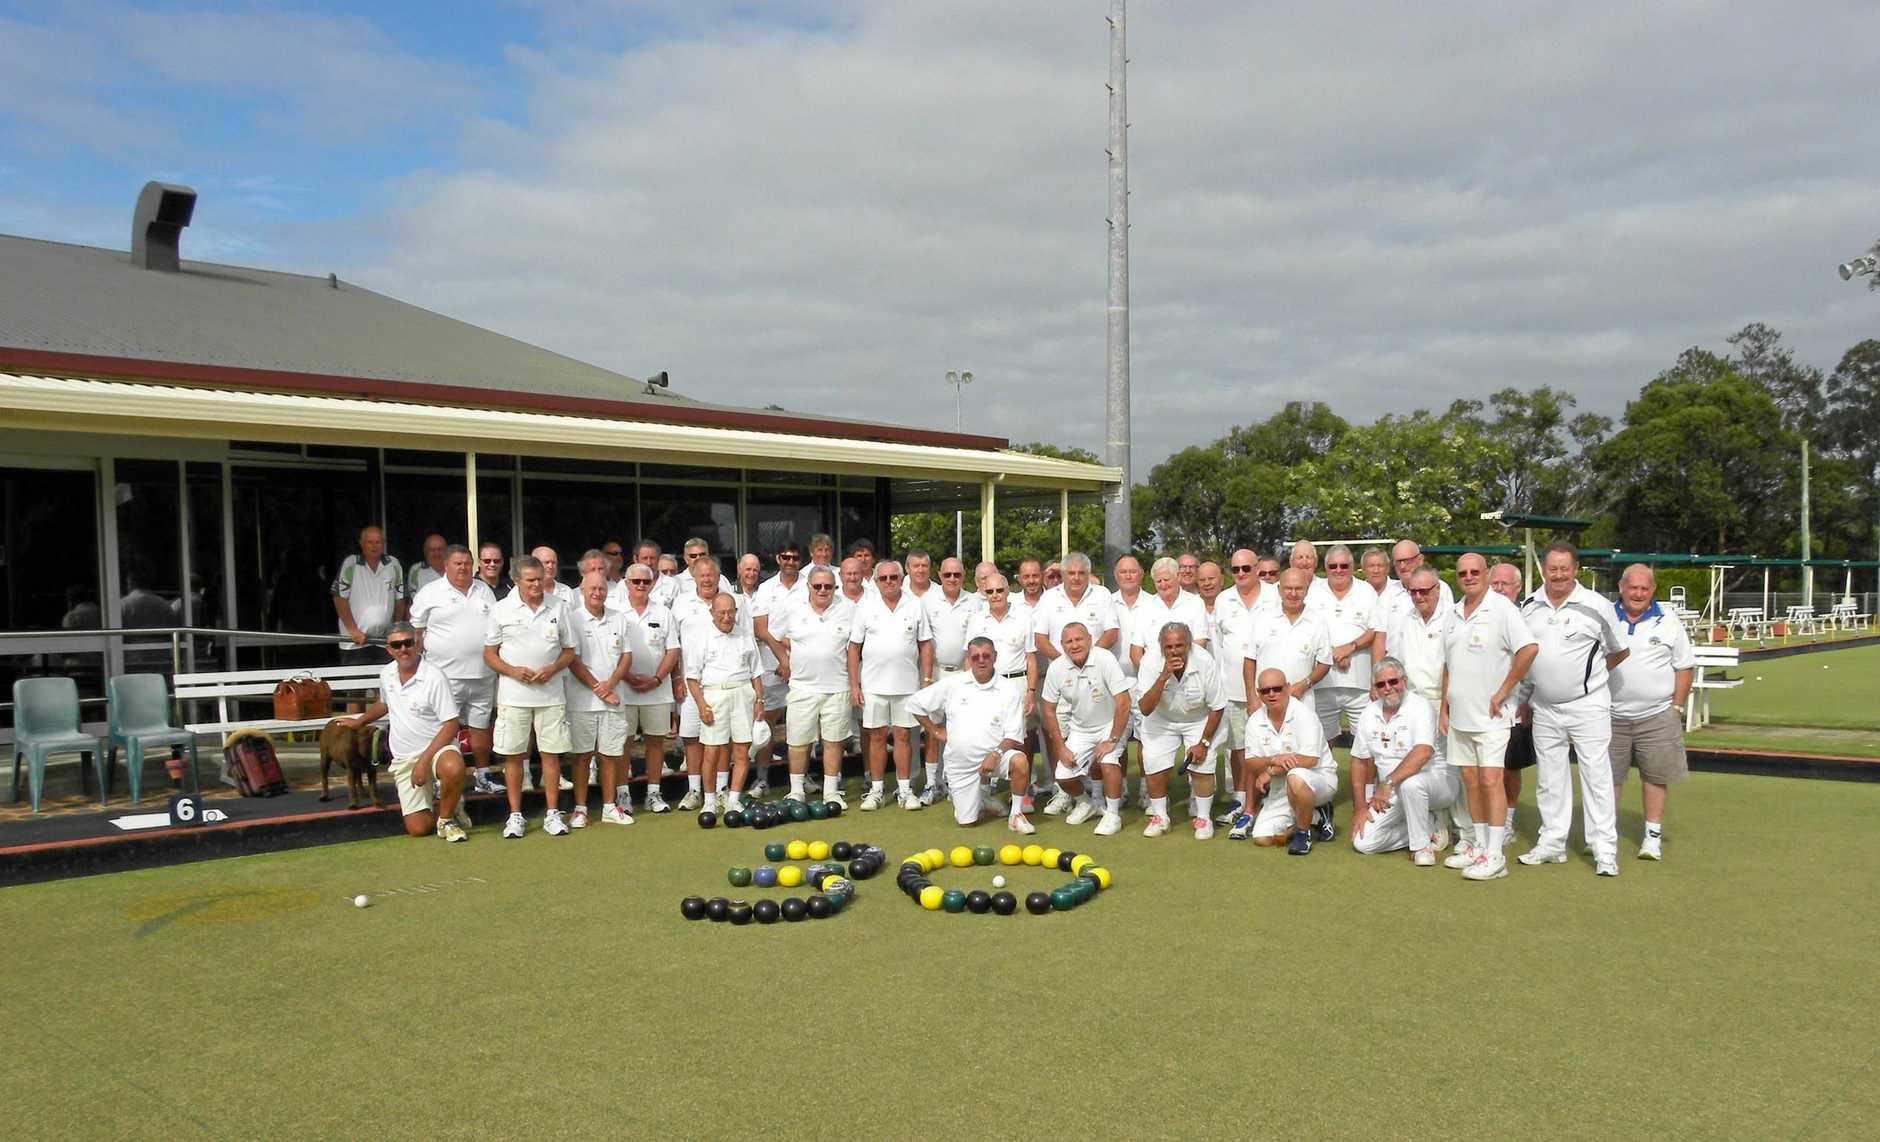 The Ballina Sandflies celebrated their 30th anniversary at the Ballina RSL Bowling Club on Sunday.